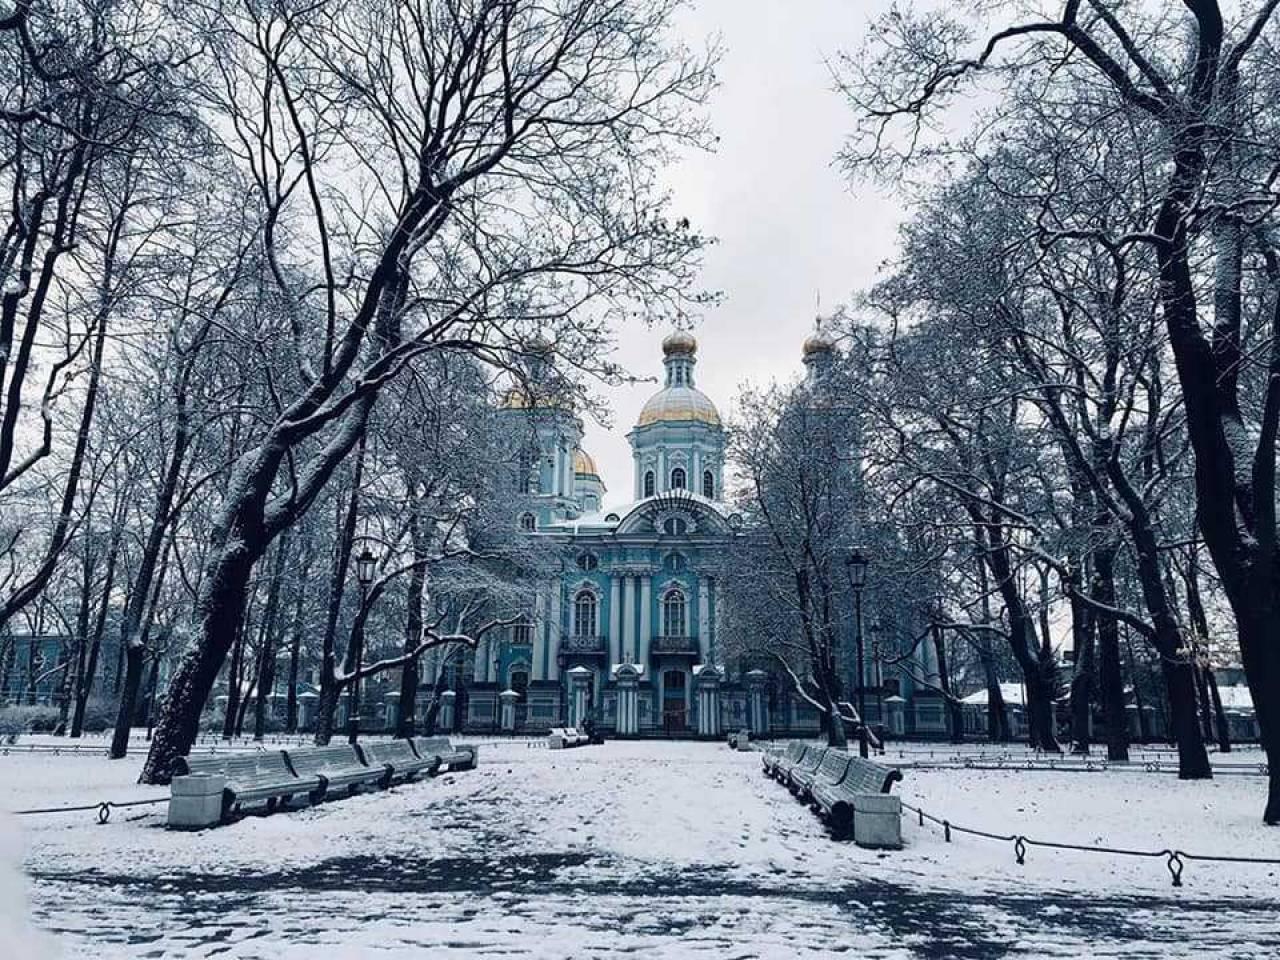 Gelo e neve sul nord Europa, qui San Pietroburgo (fonte severe weather)